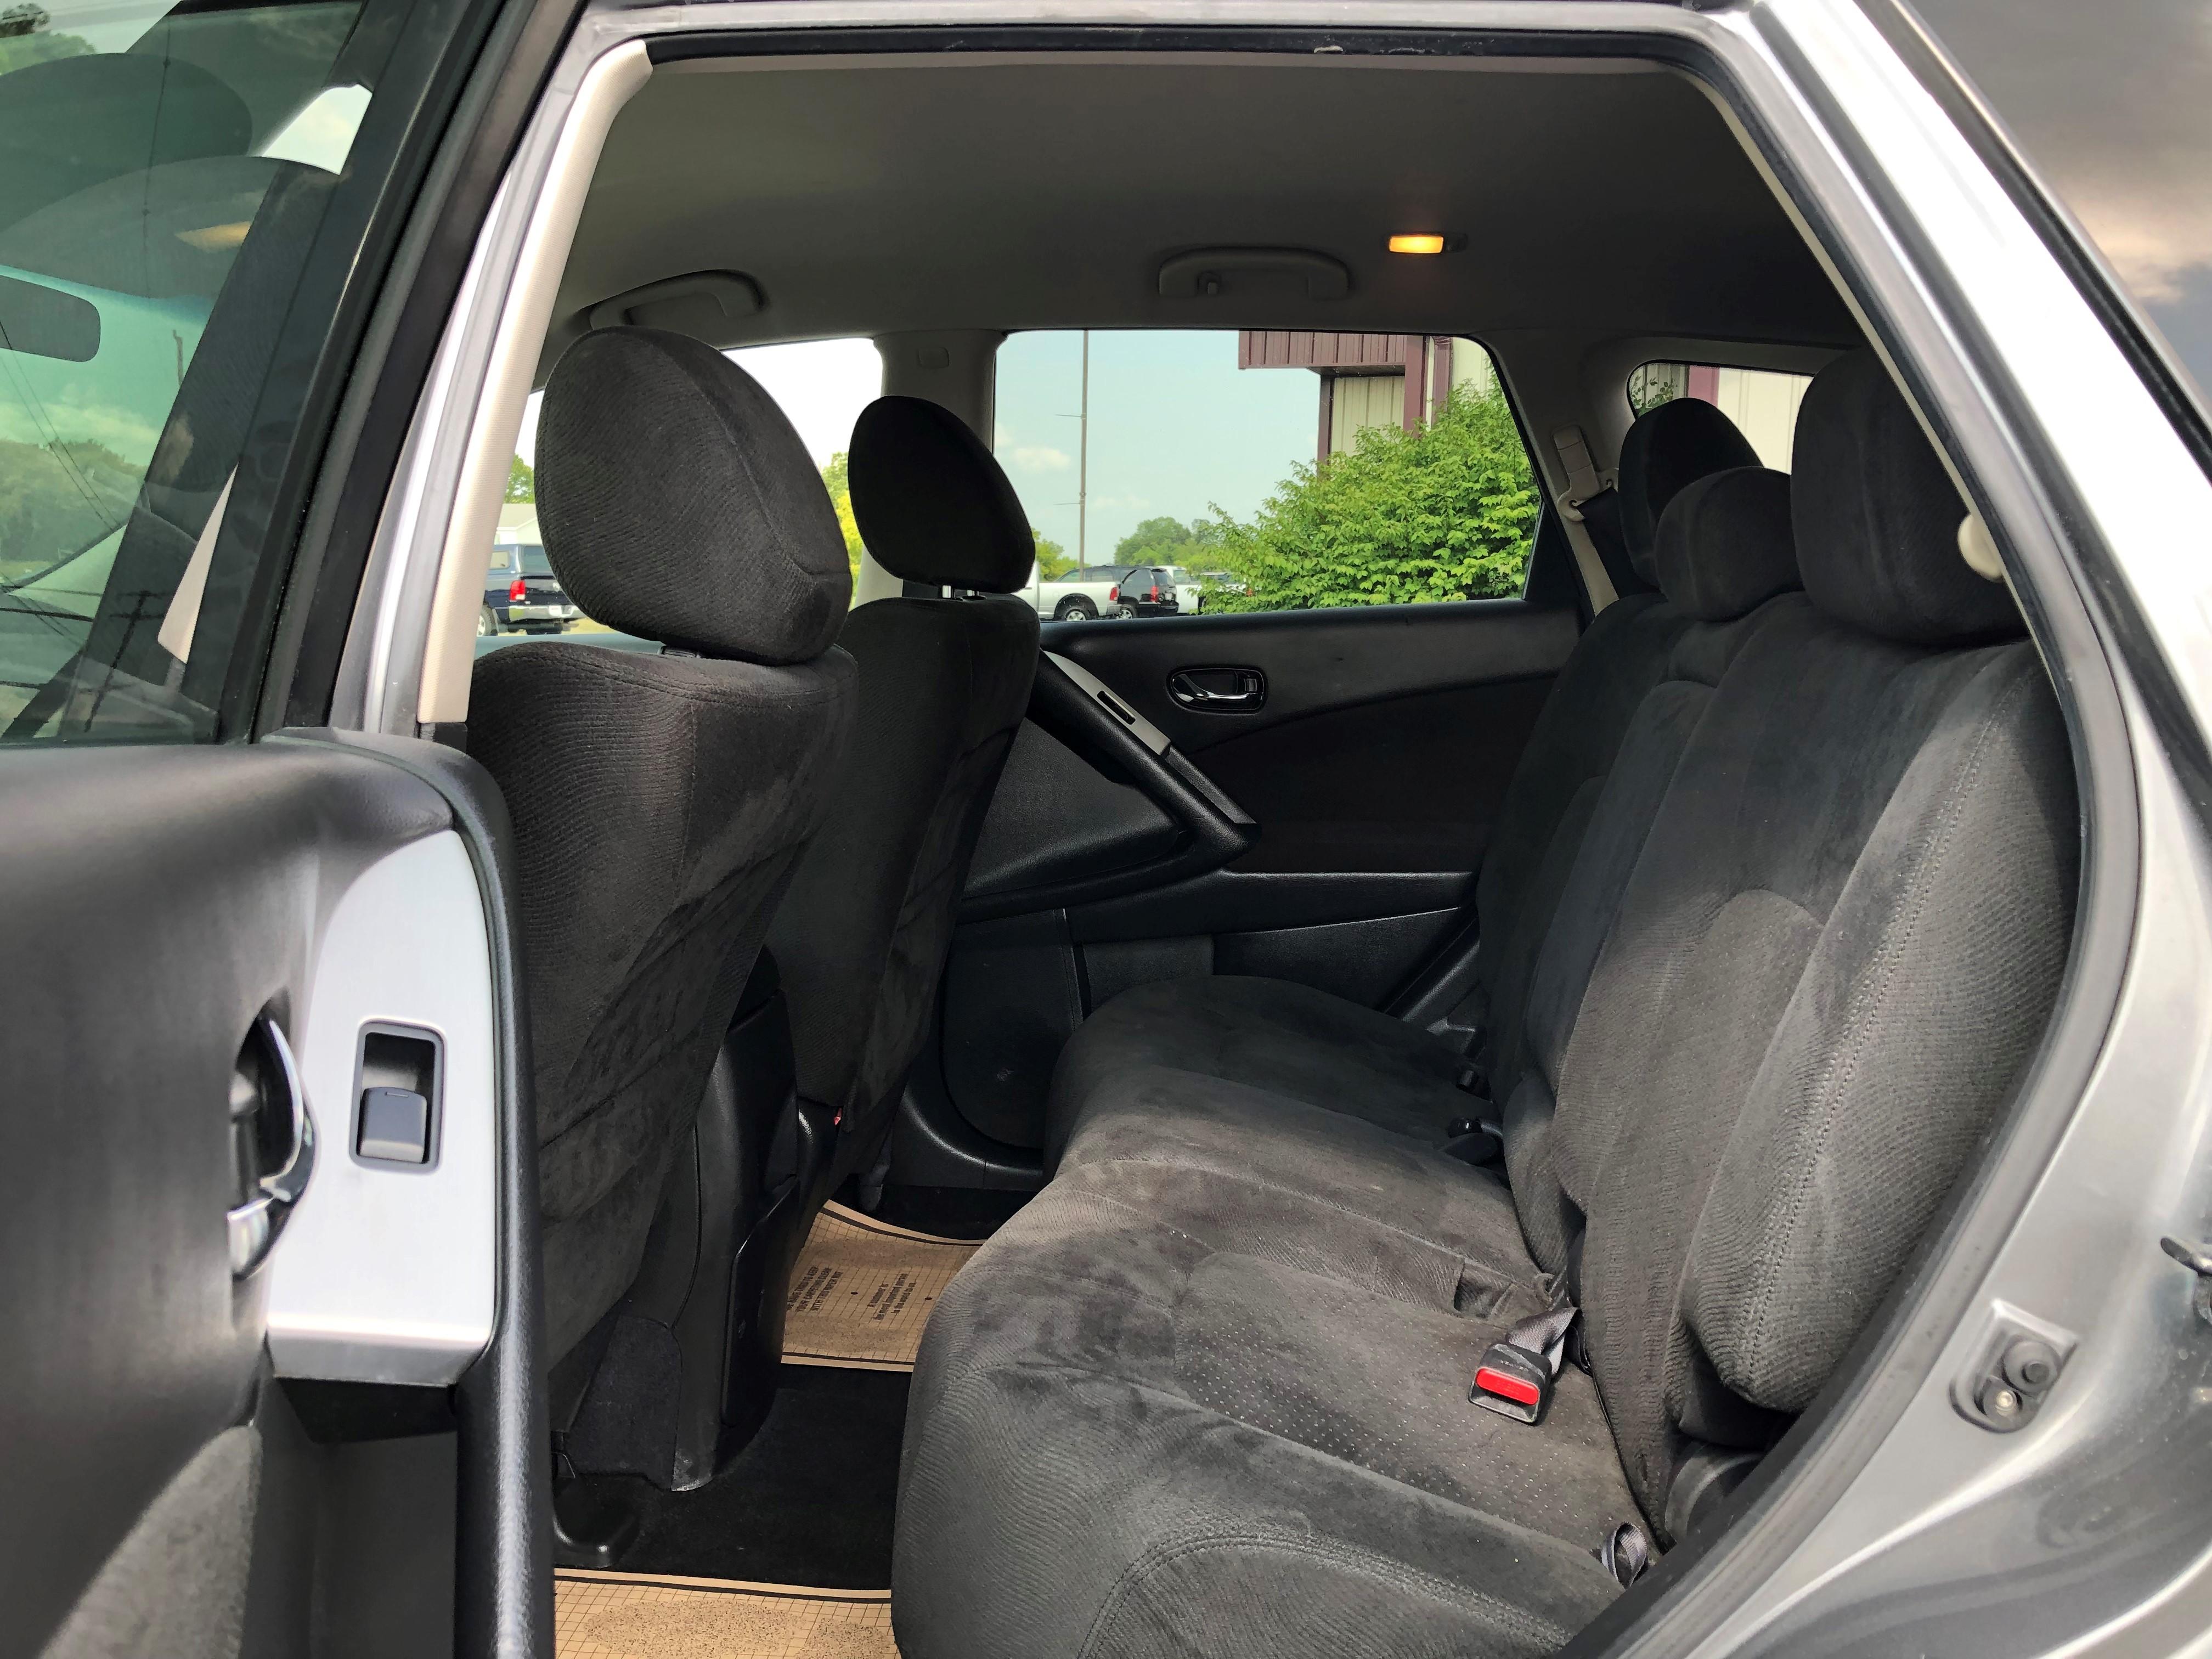 used vehicle - SUV NISSAN MURANO 2014